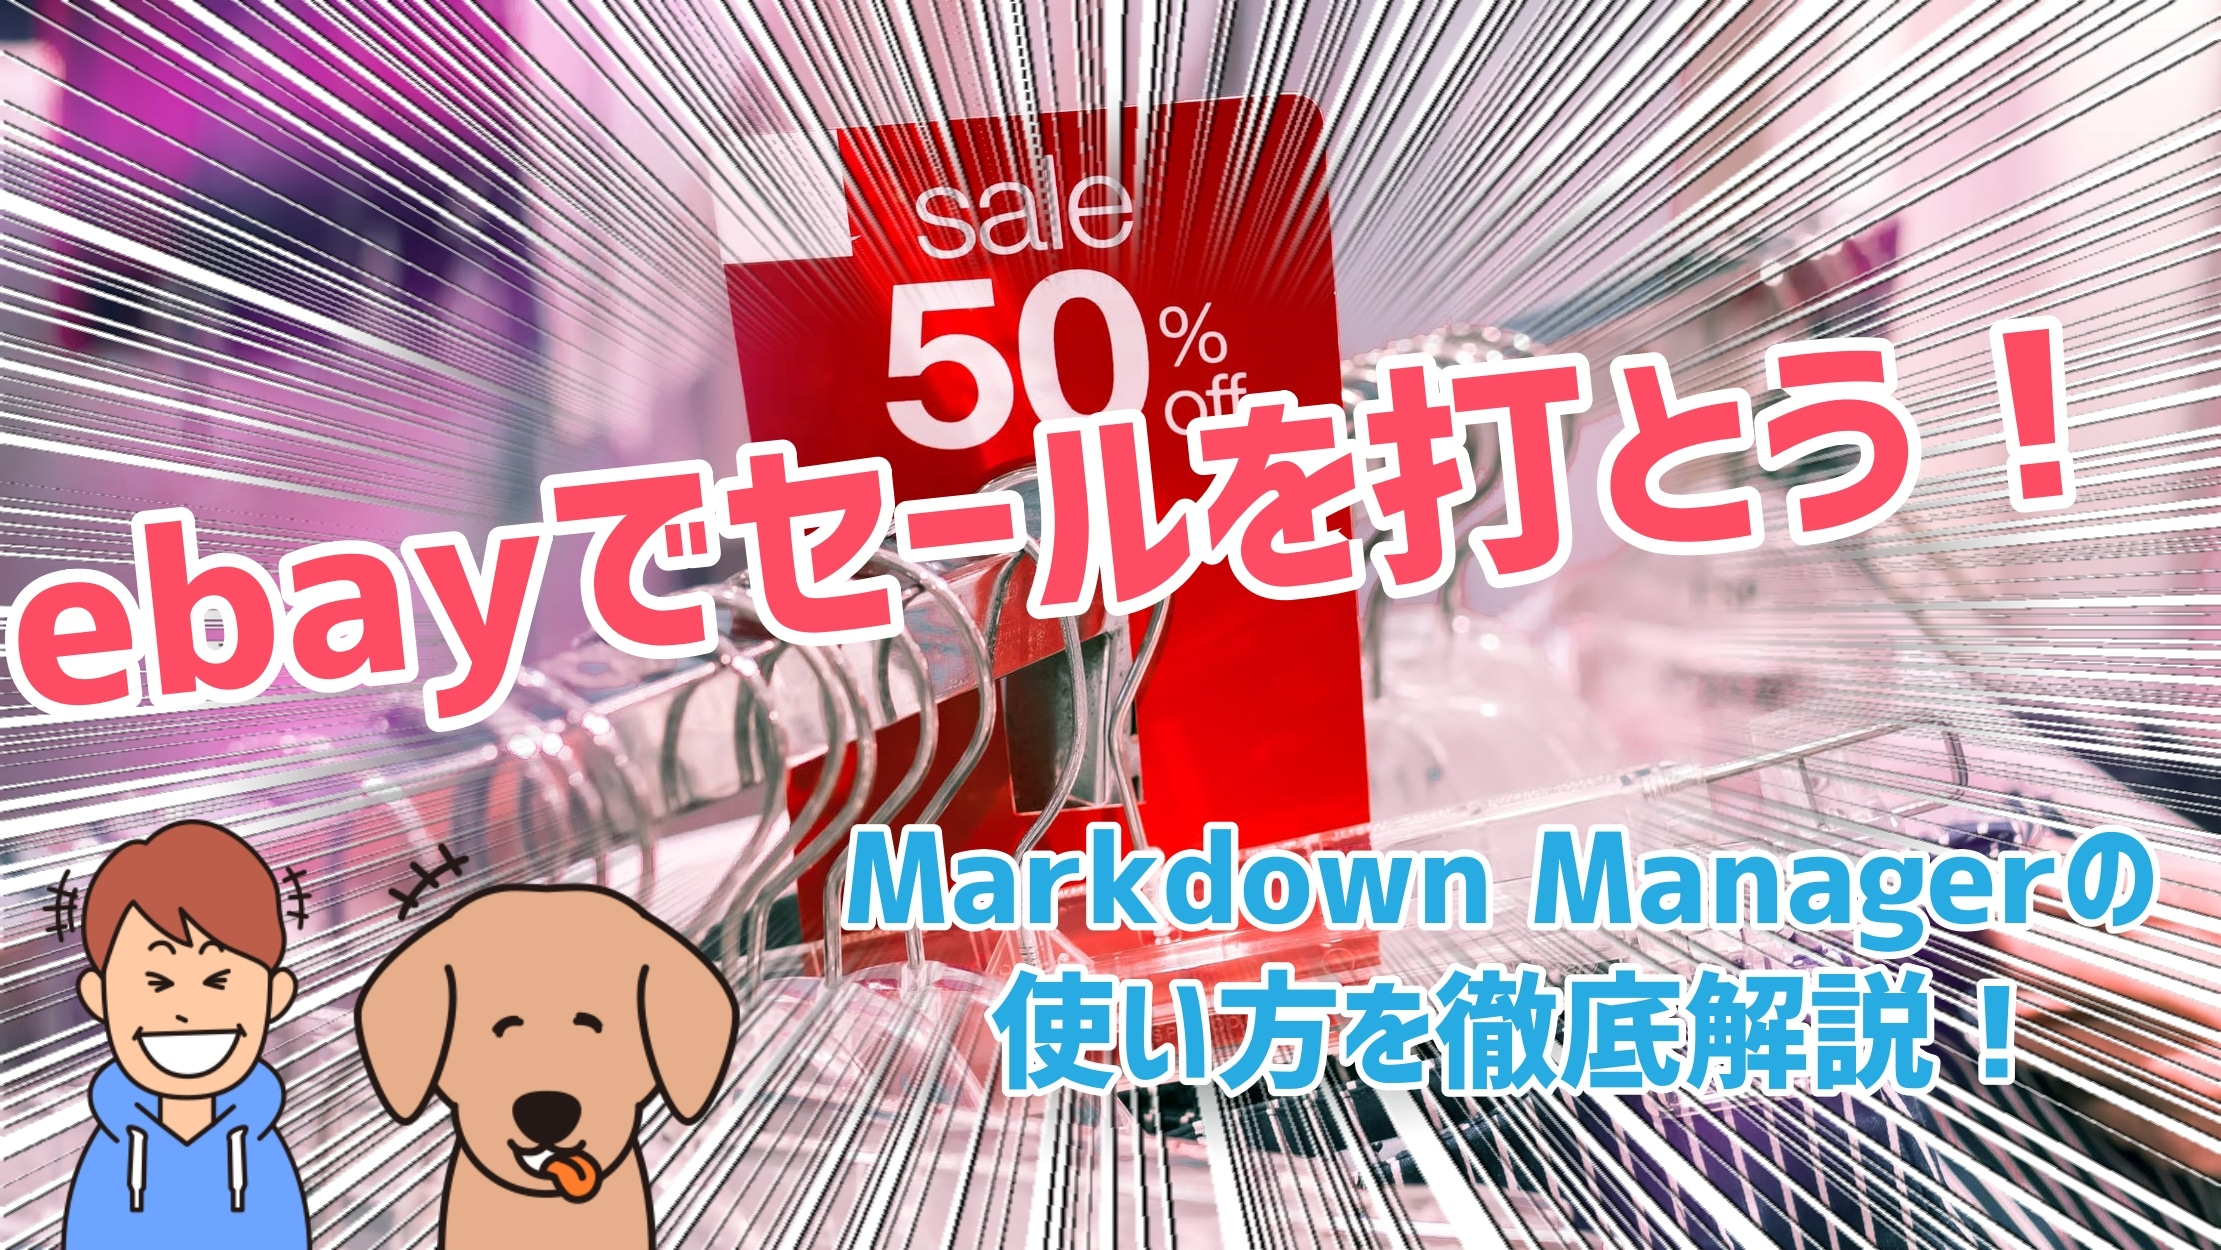 【ebay輸出】セールで売上爆発!?Markdown Managerの効果的な使い方を解説!